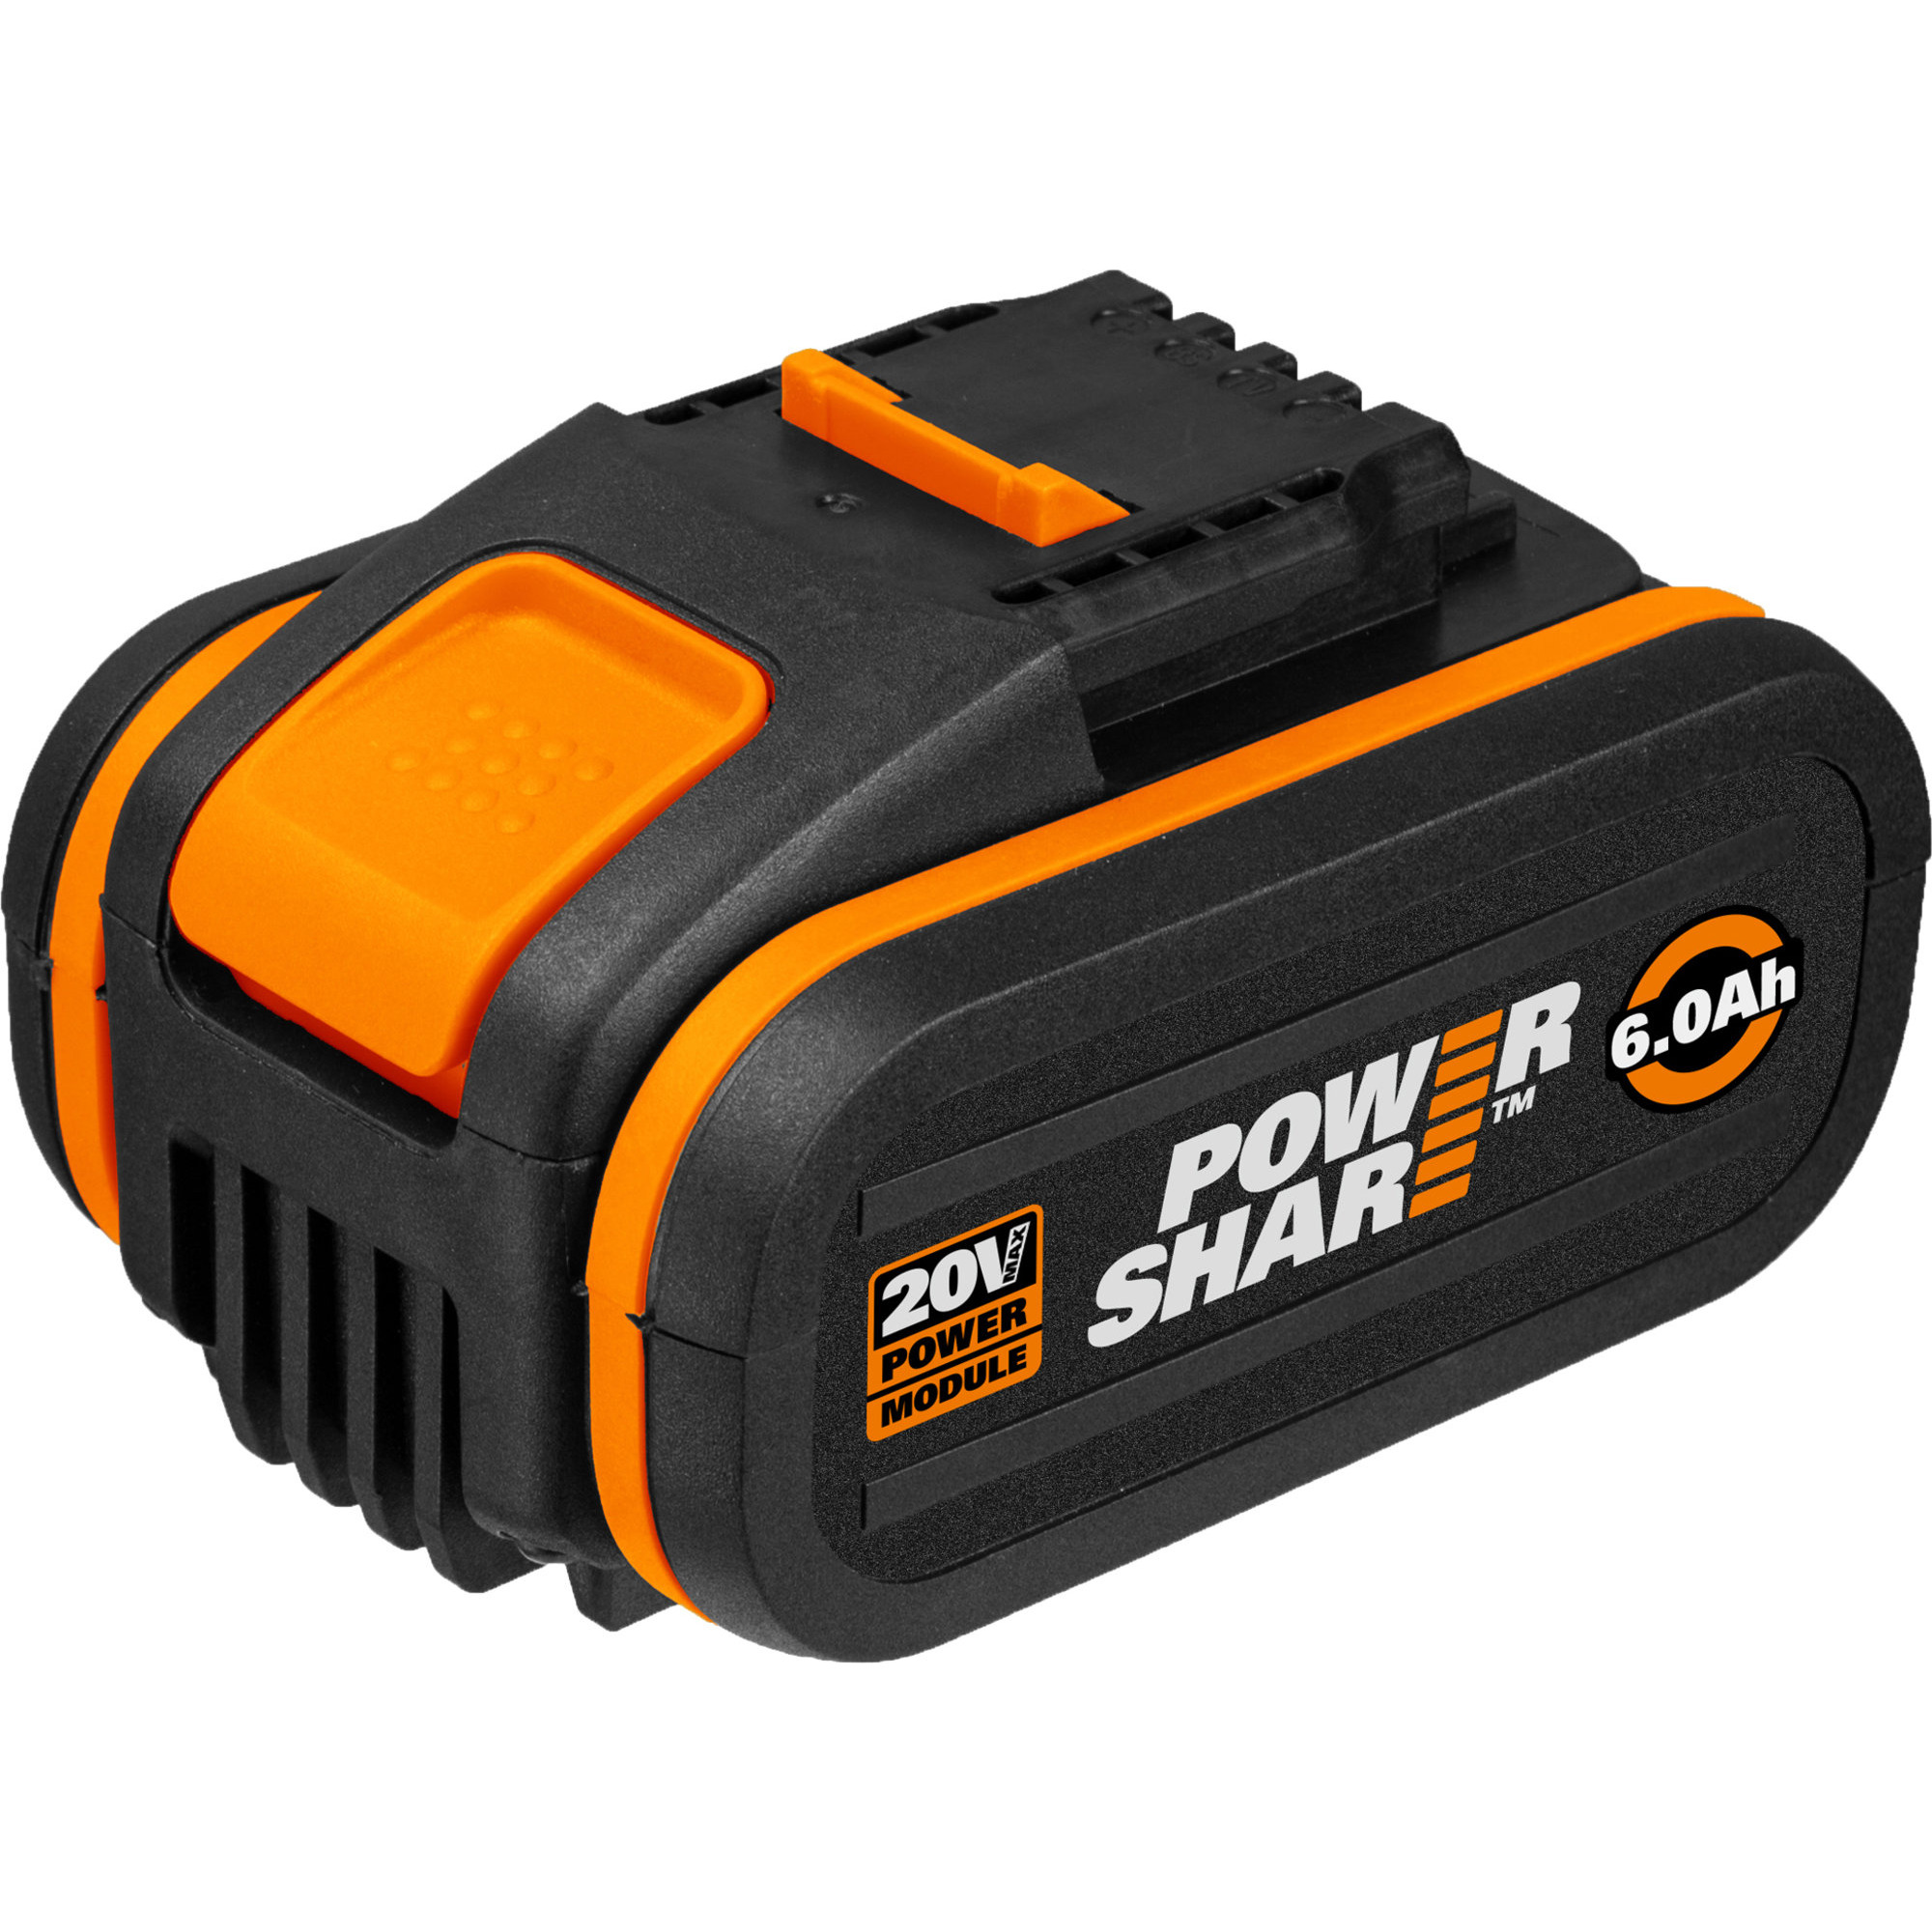 Worx WA3641 20V 6.0Ah-batteri med indikator